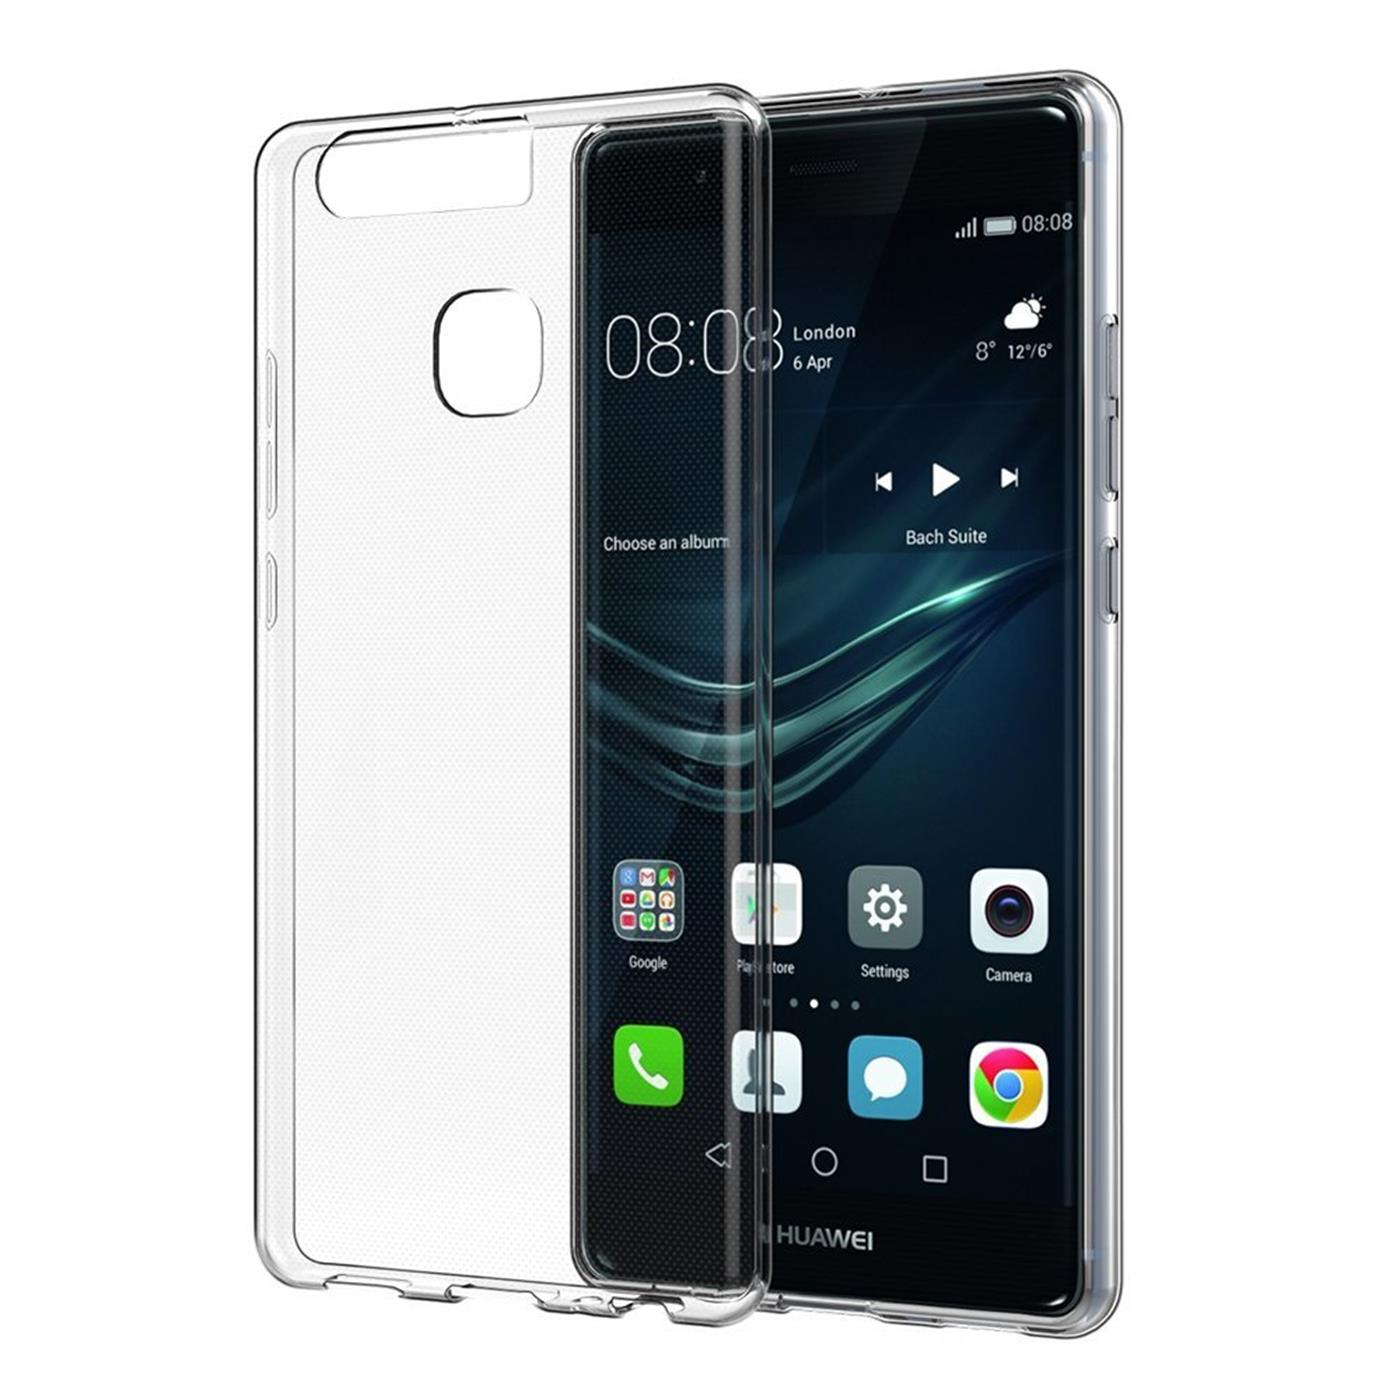 Huawei-p9-Duenn-Silikon-Klar-Case-Cover-Ultra-Slim-Stossfeste-Gel-Rueckseite Indexbild 5